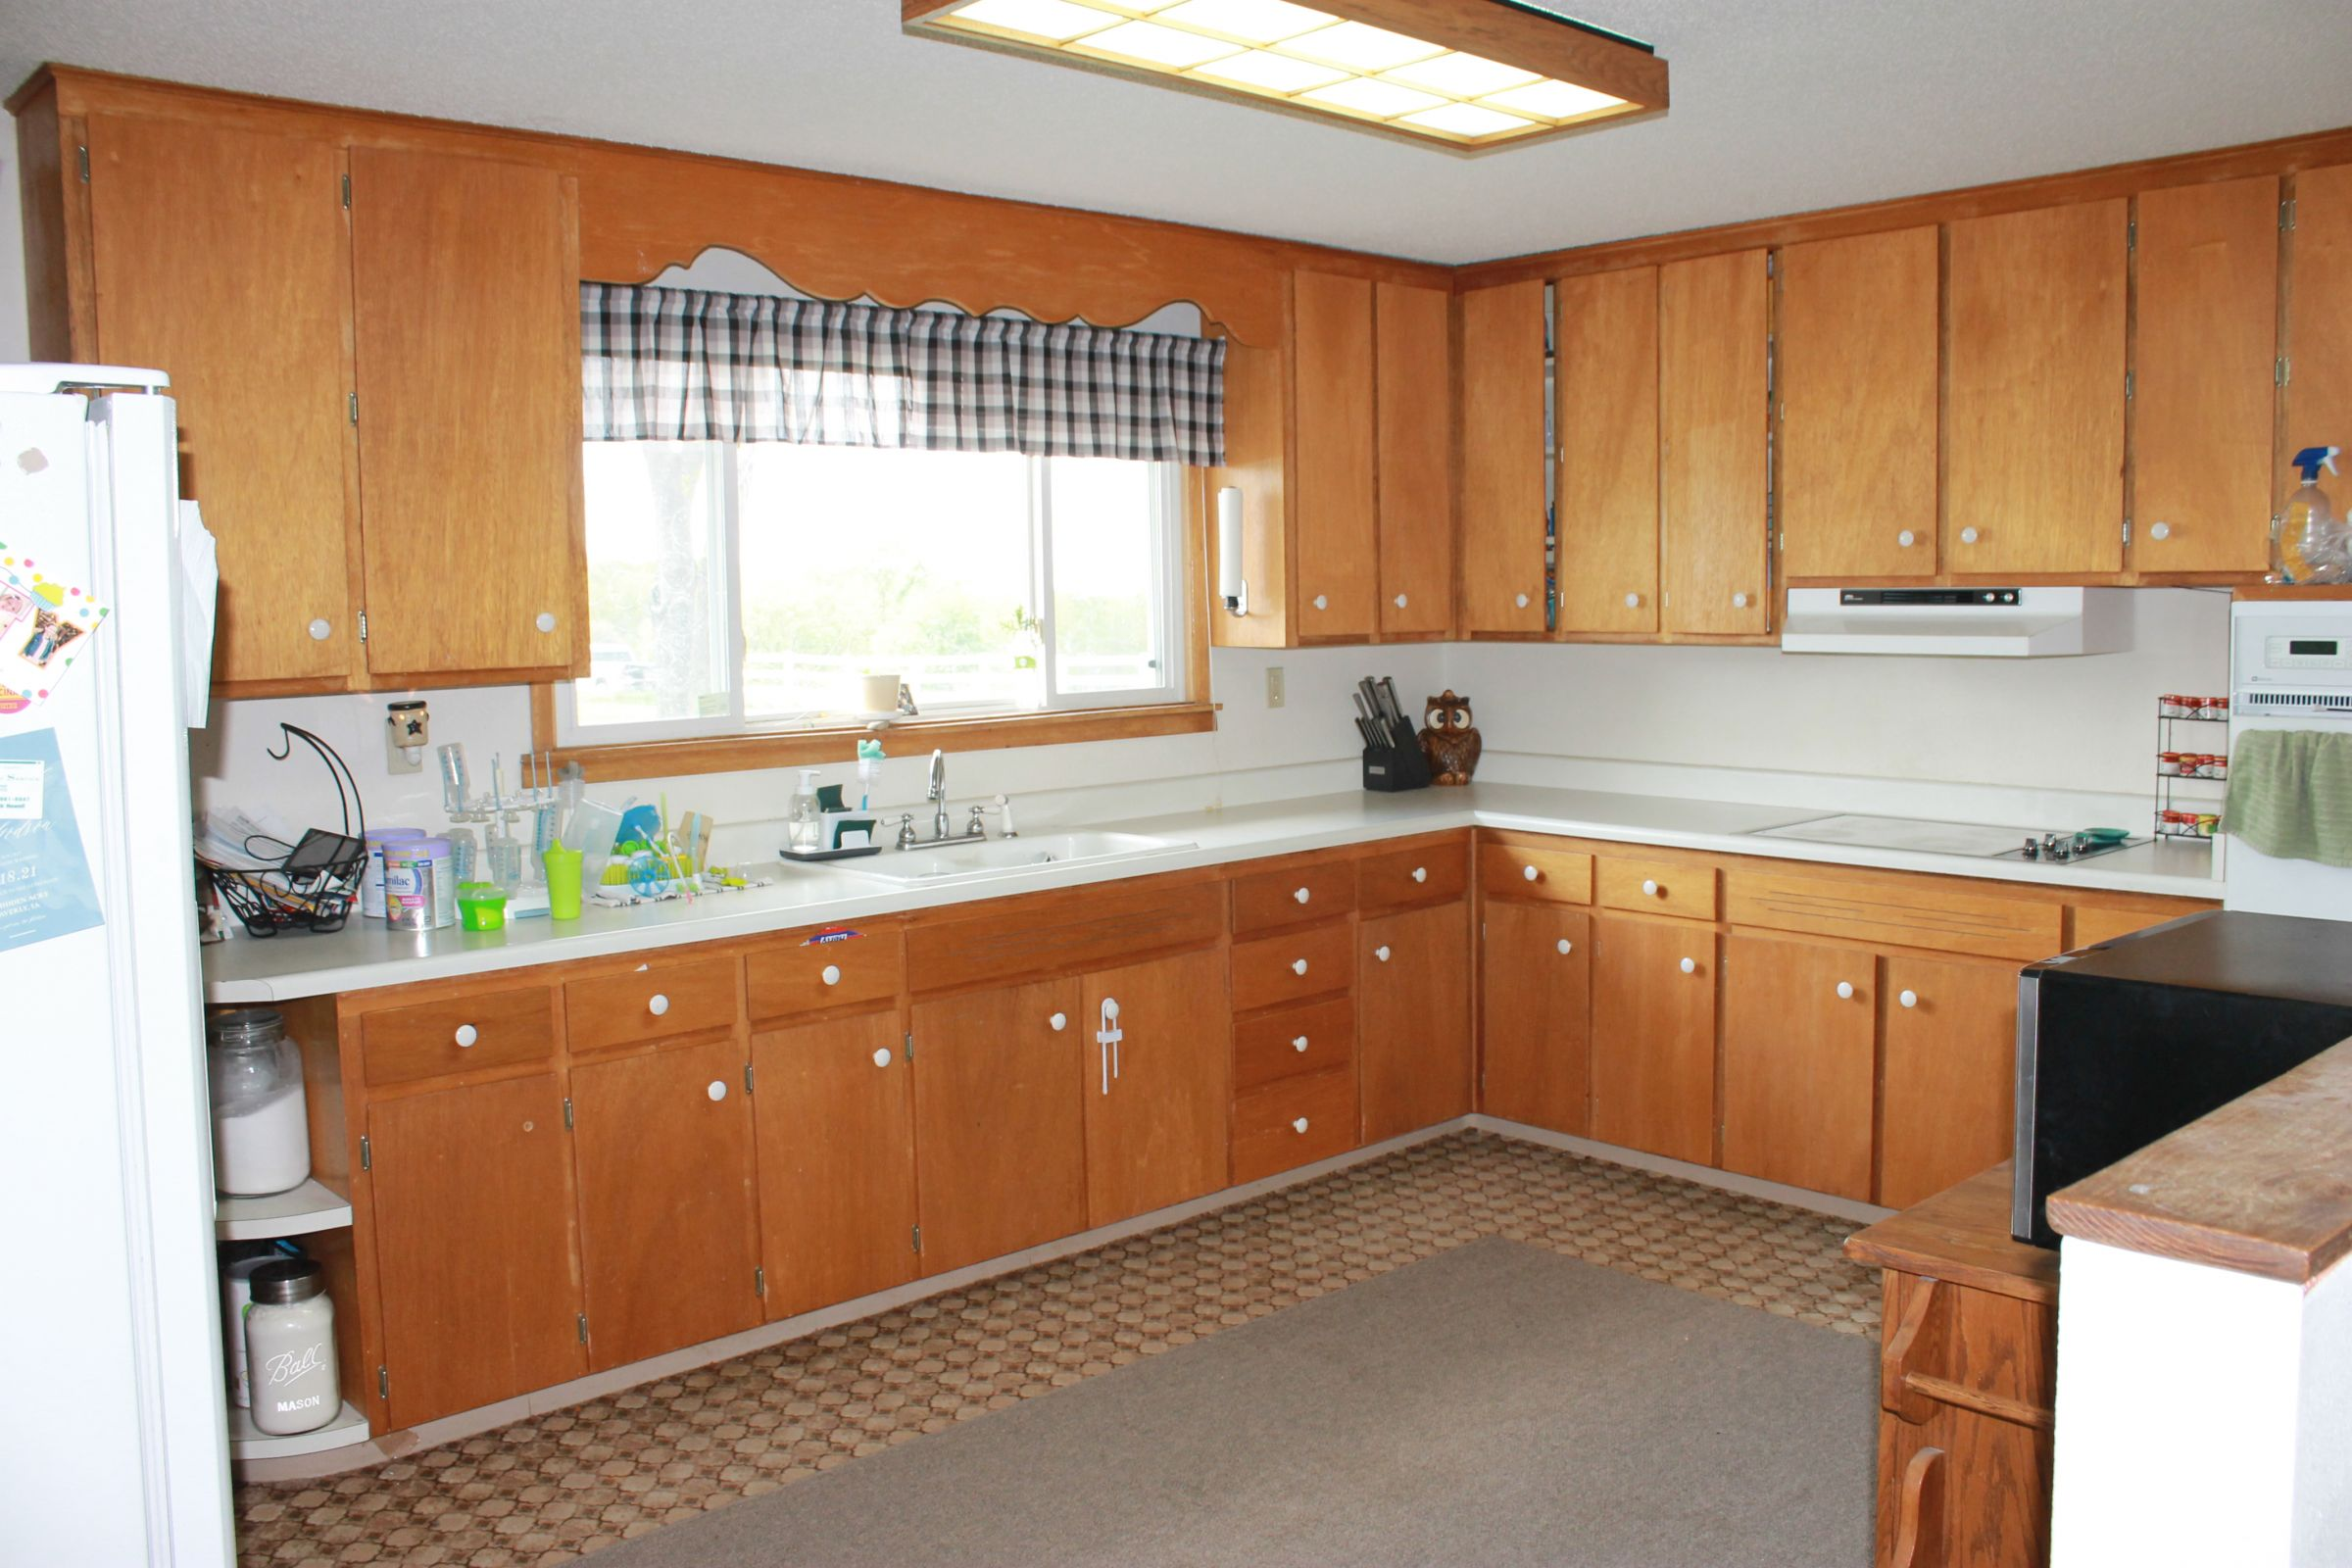 residential-development-land-warren-county-iowa-38-acres-listing-number-15513-2-2021-05-06-210432.JPG